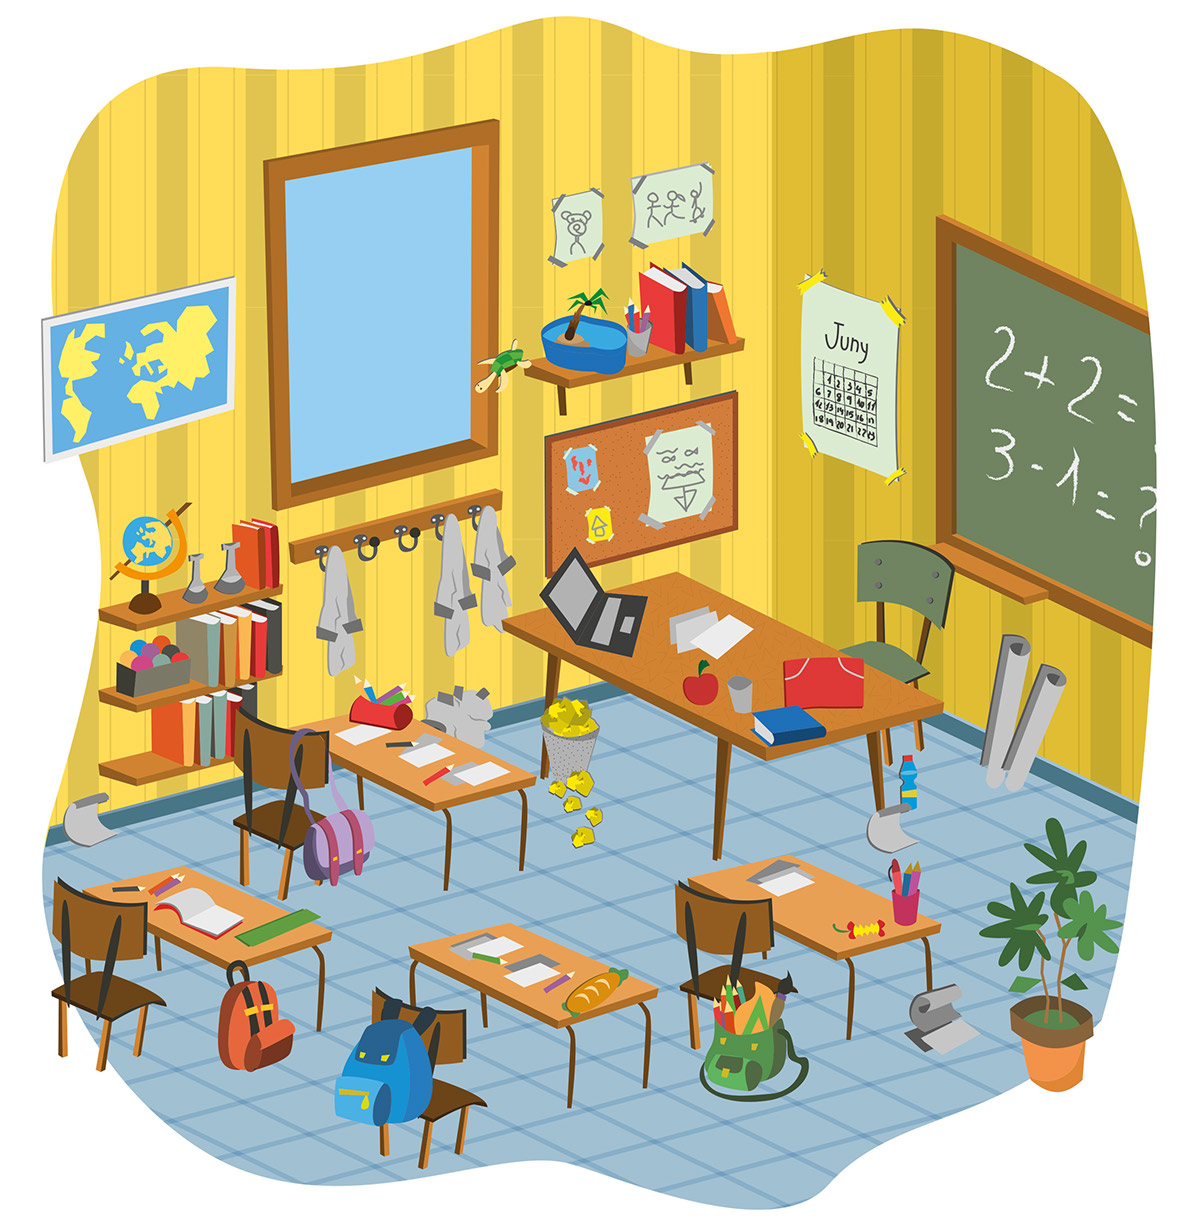 School Classroom Cartoon Vector Pack On Behance